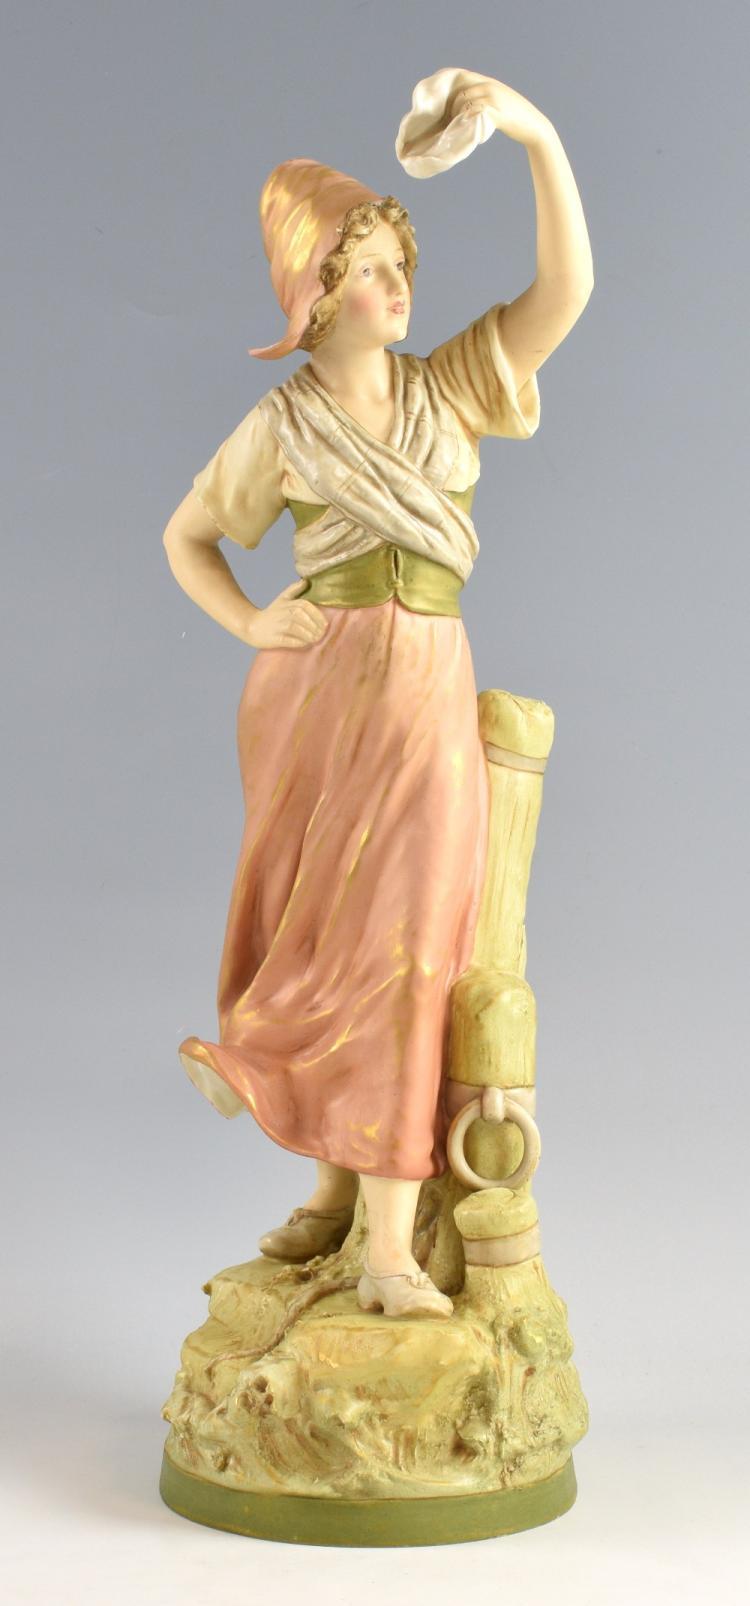 Royal Dux figure of a young woman waving a white h